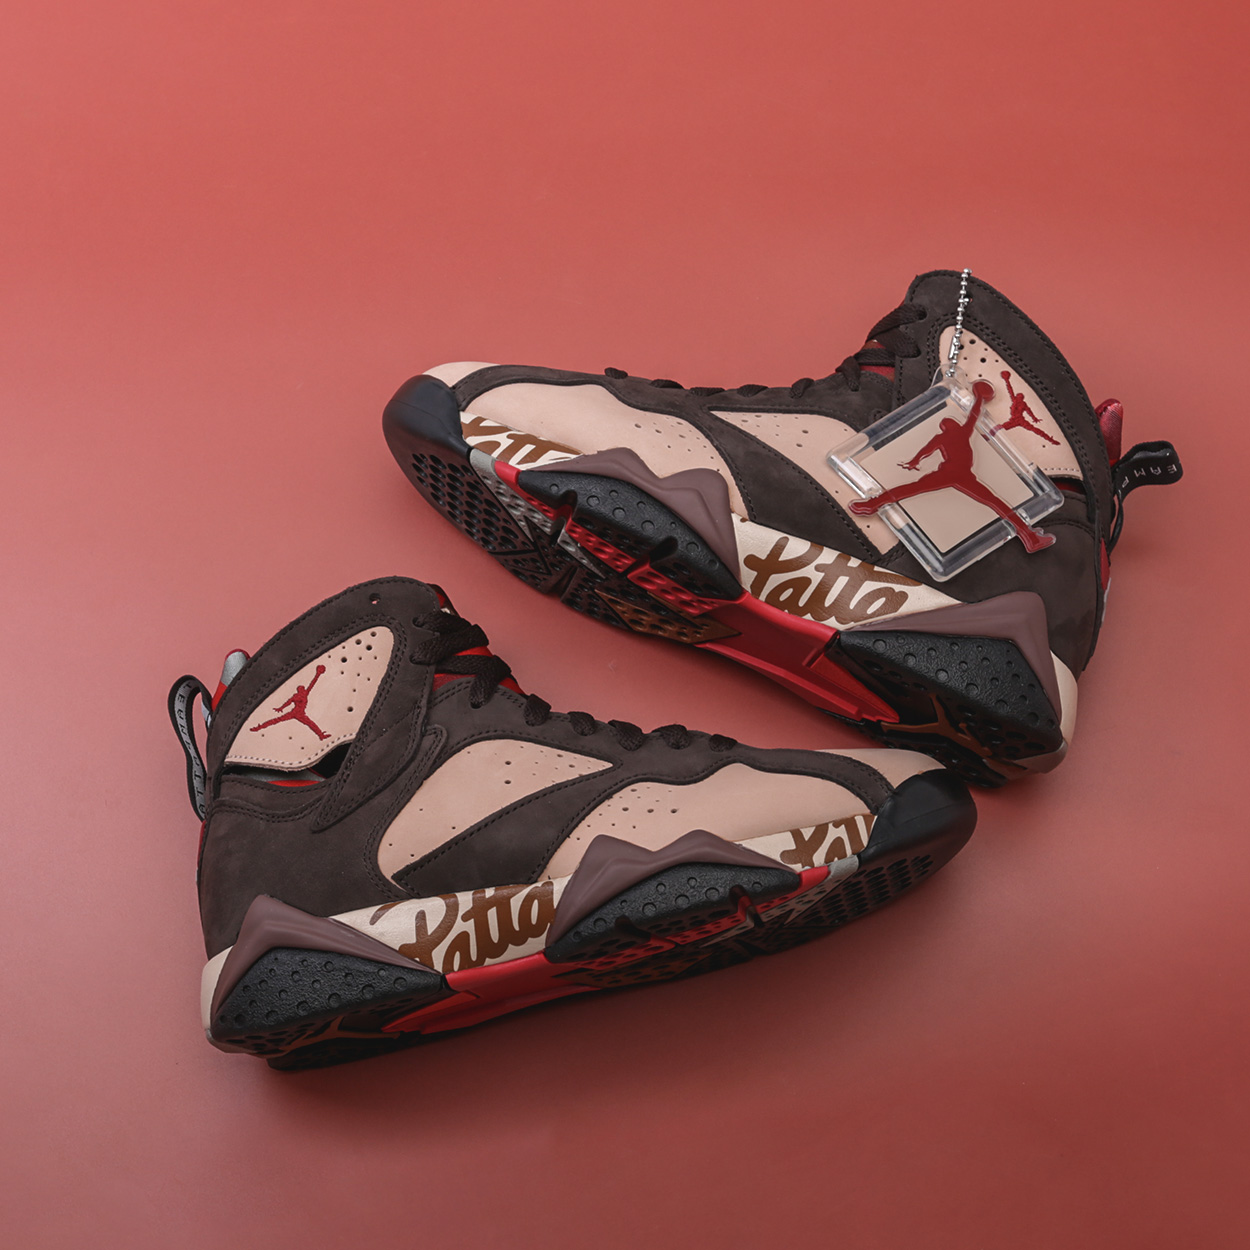 Кроссовки Jordan 7 Retro Patta